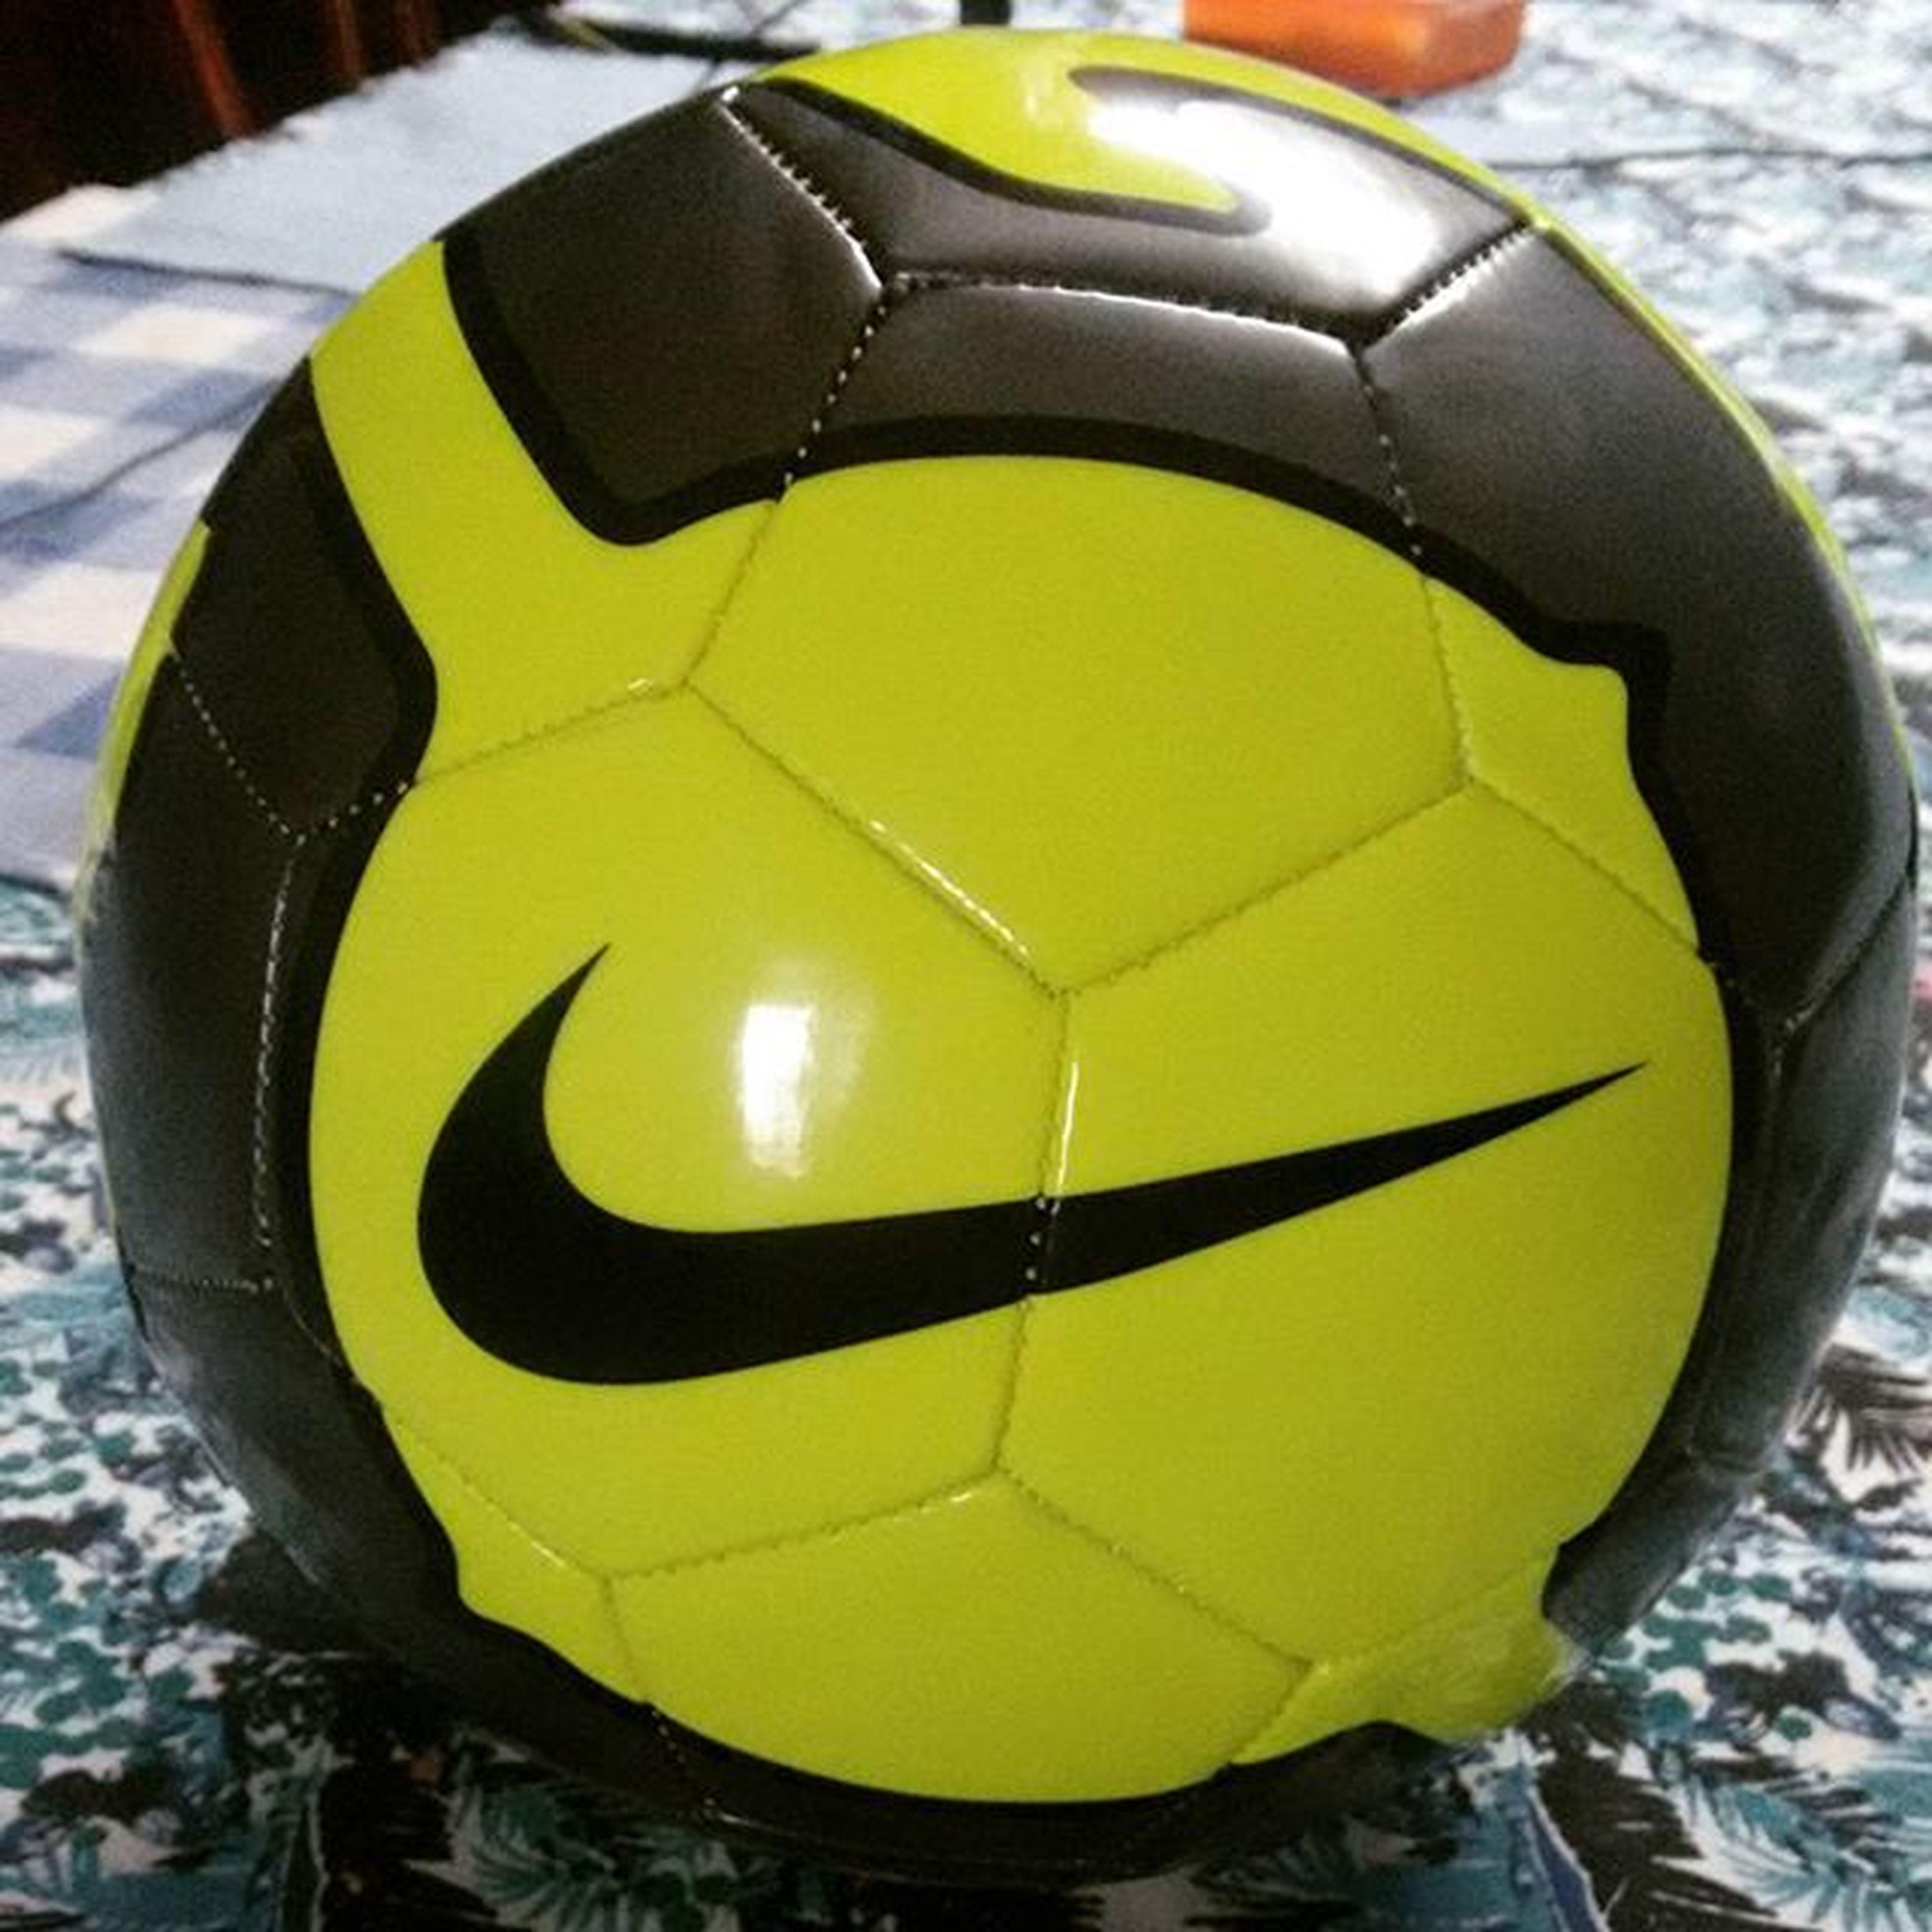 NikeReact Football Awesome Instaclick Instagood